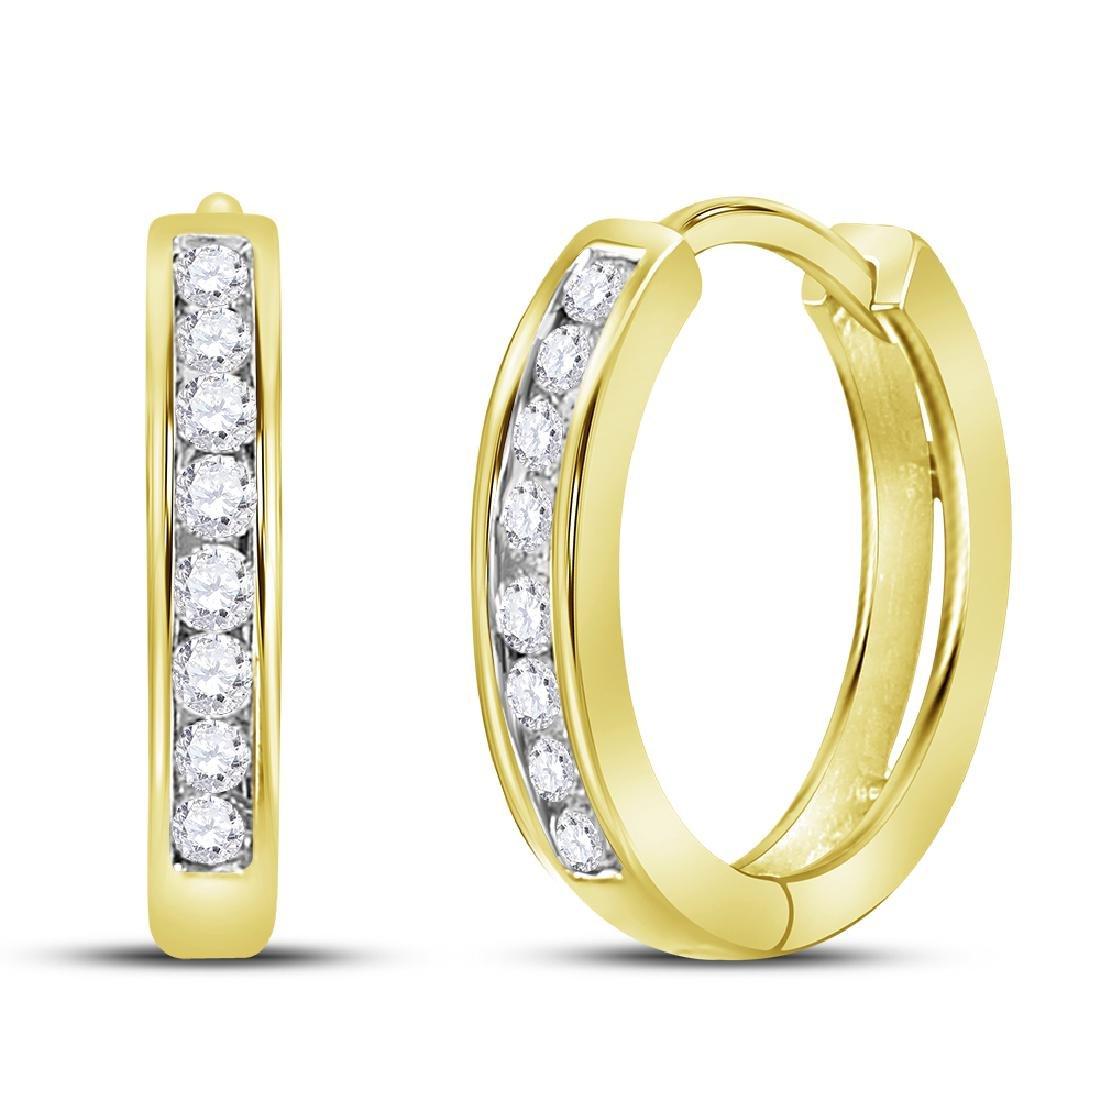 0.25 CTW Diamond Hoop Earrings 14KT Yellow Gold -